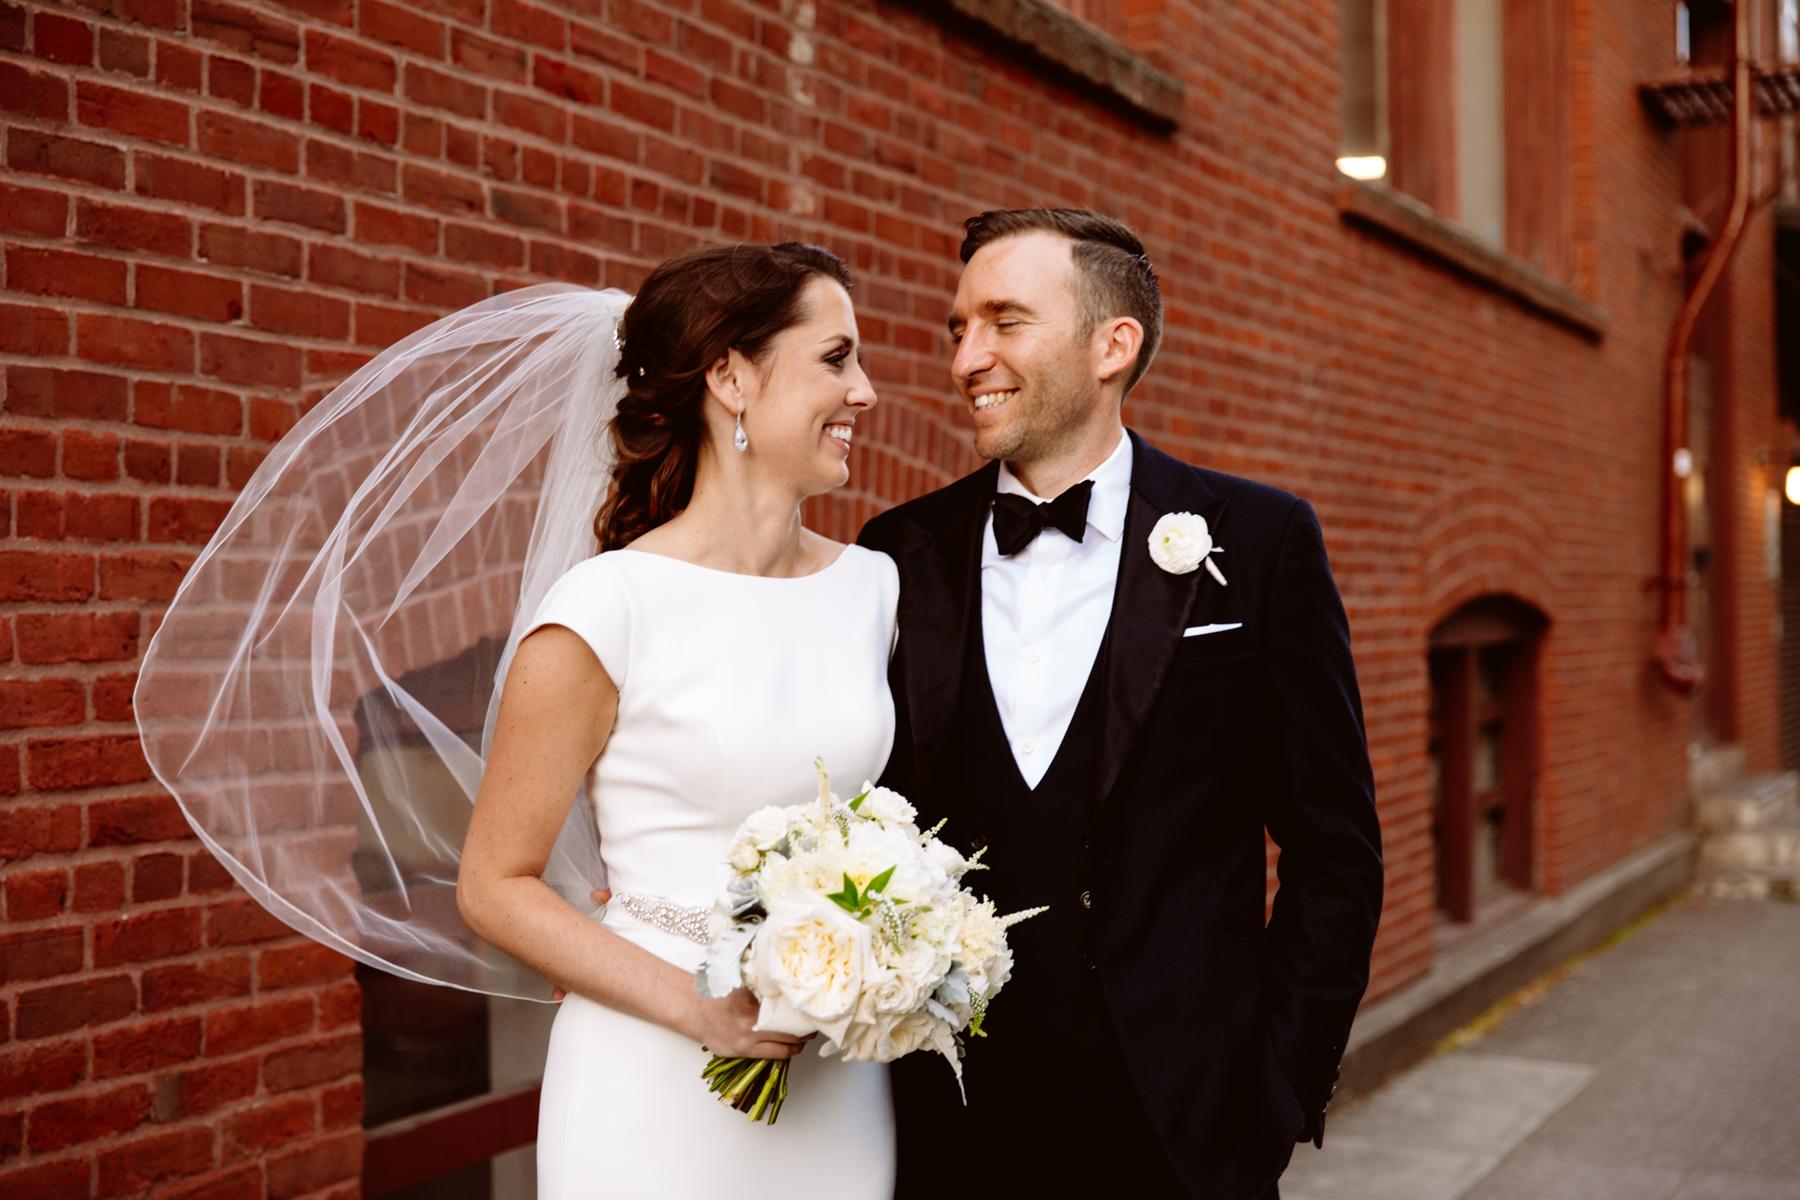 Barrick-Shinabarger-Wedding-519.jpg